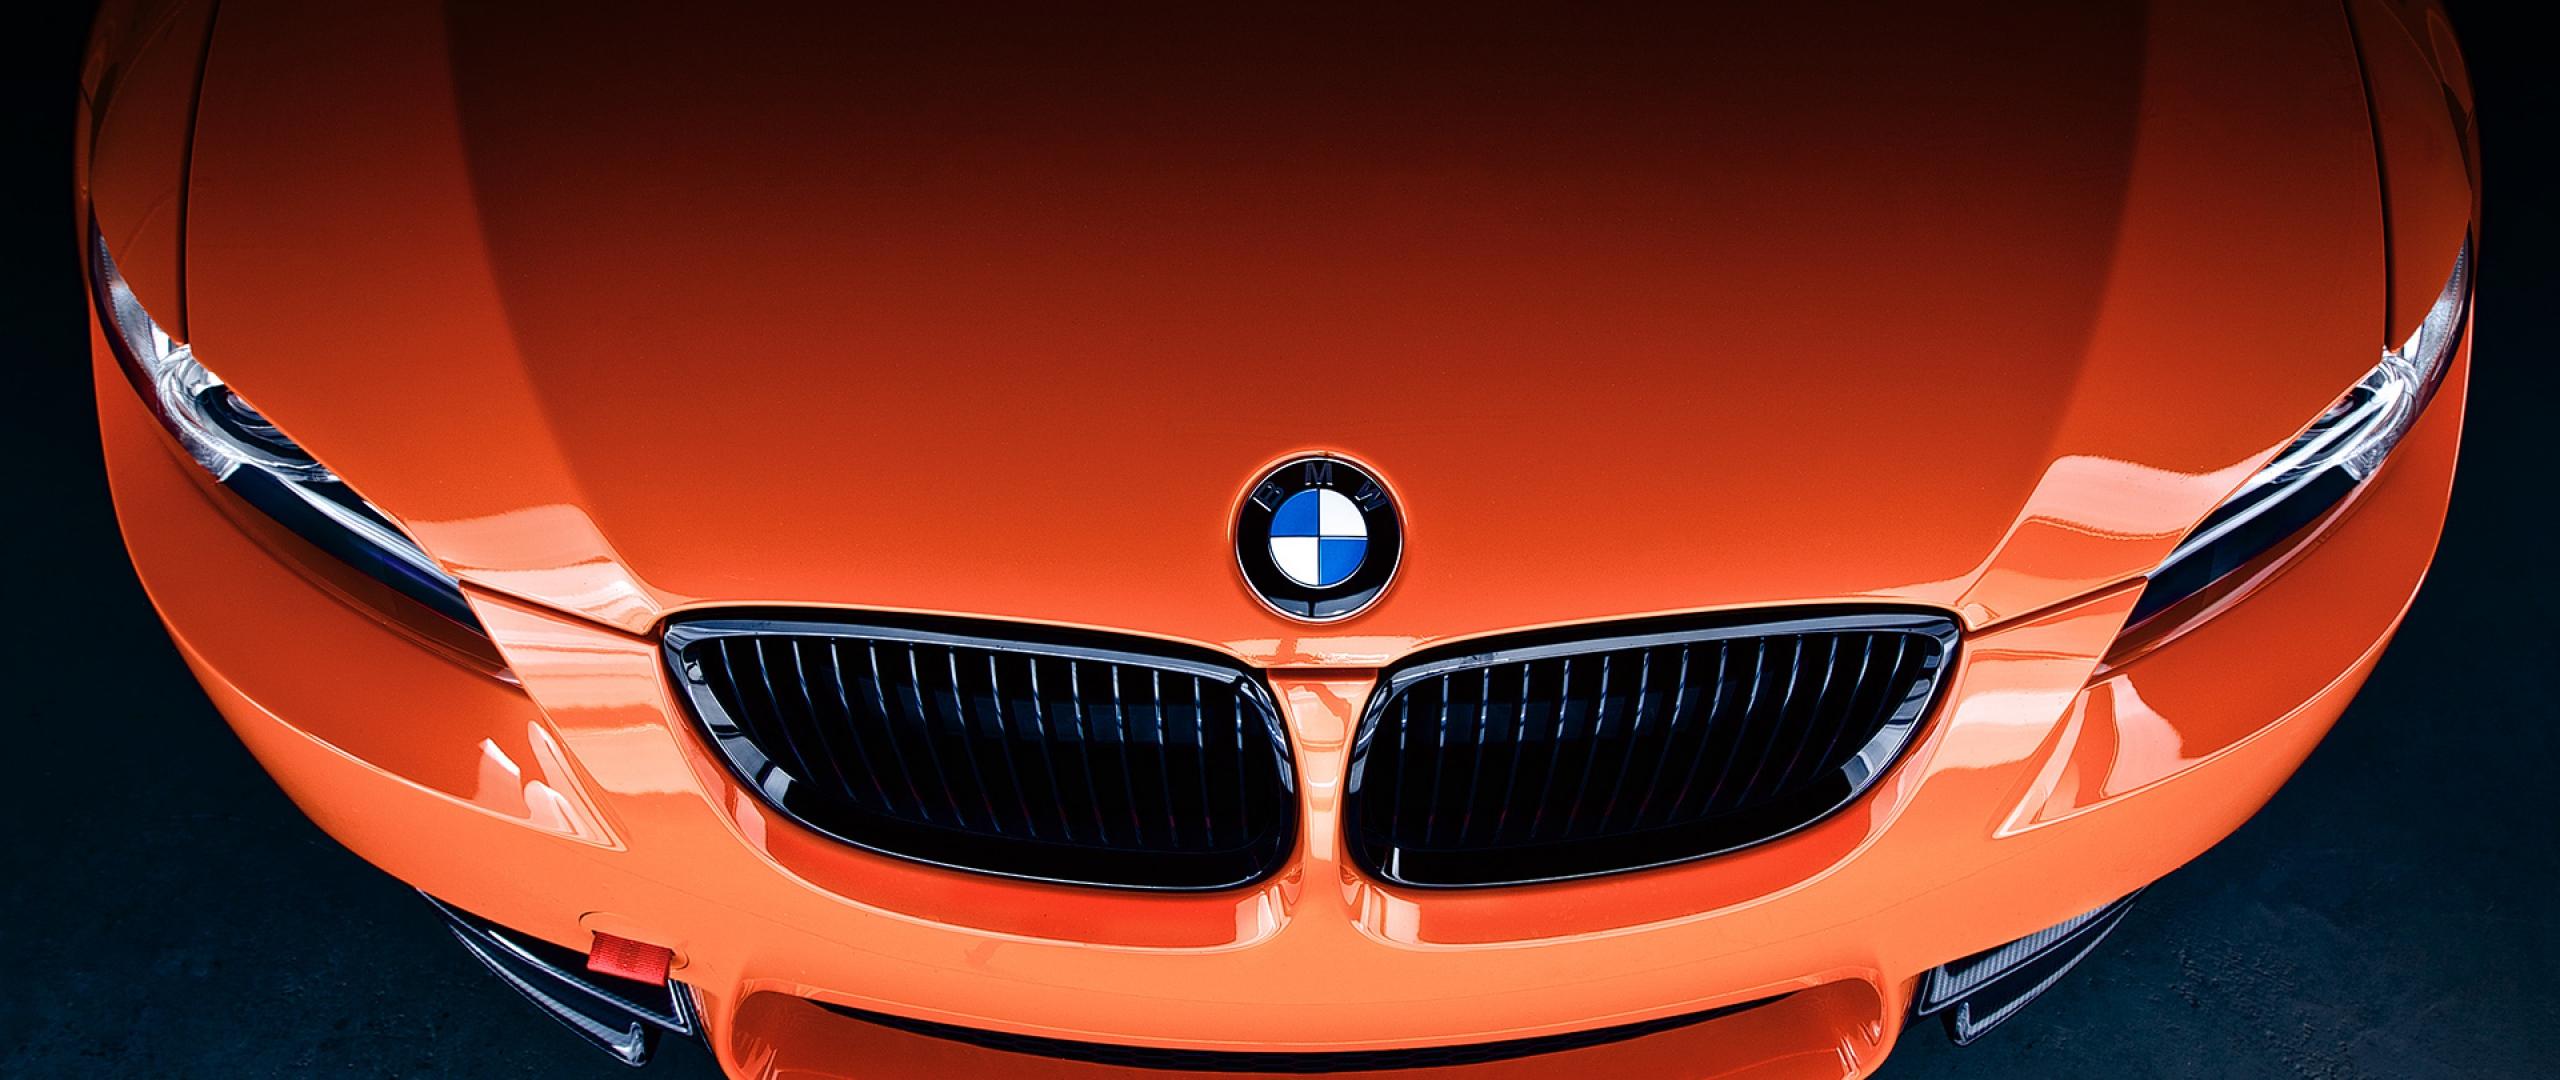 Wallpaper 2560x1080 bmw m3 front orange label icon 2560x1080 2560x1080